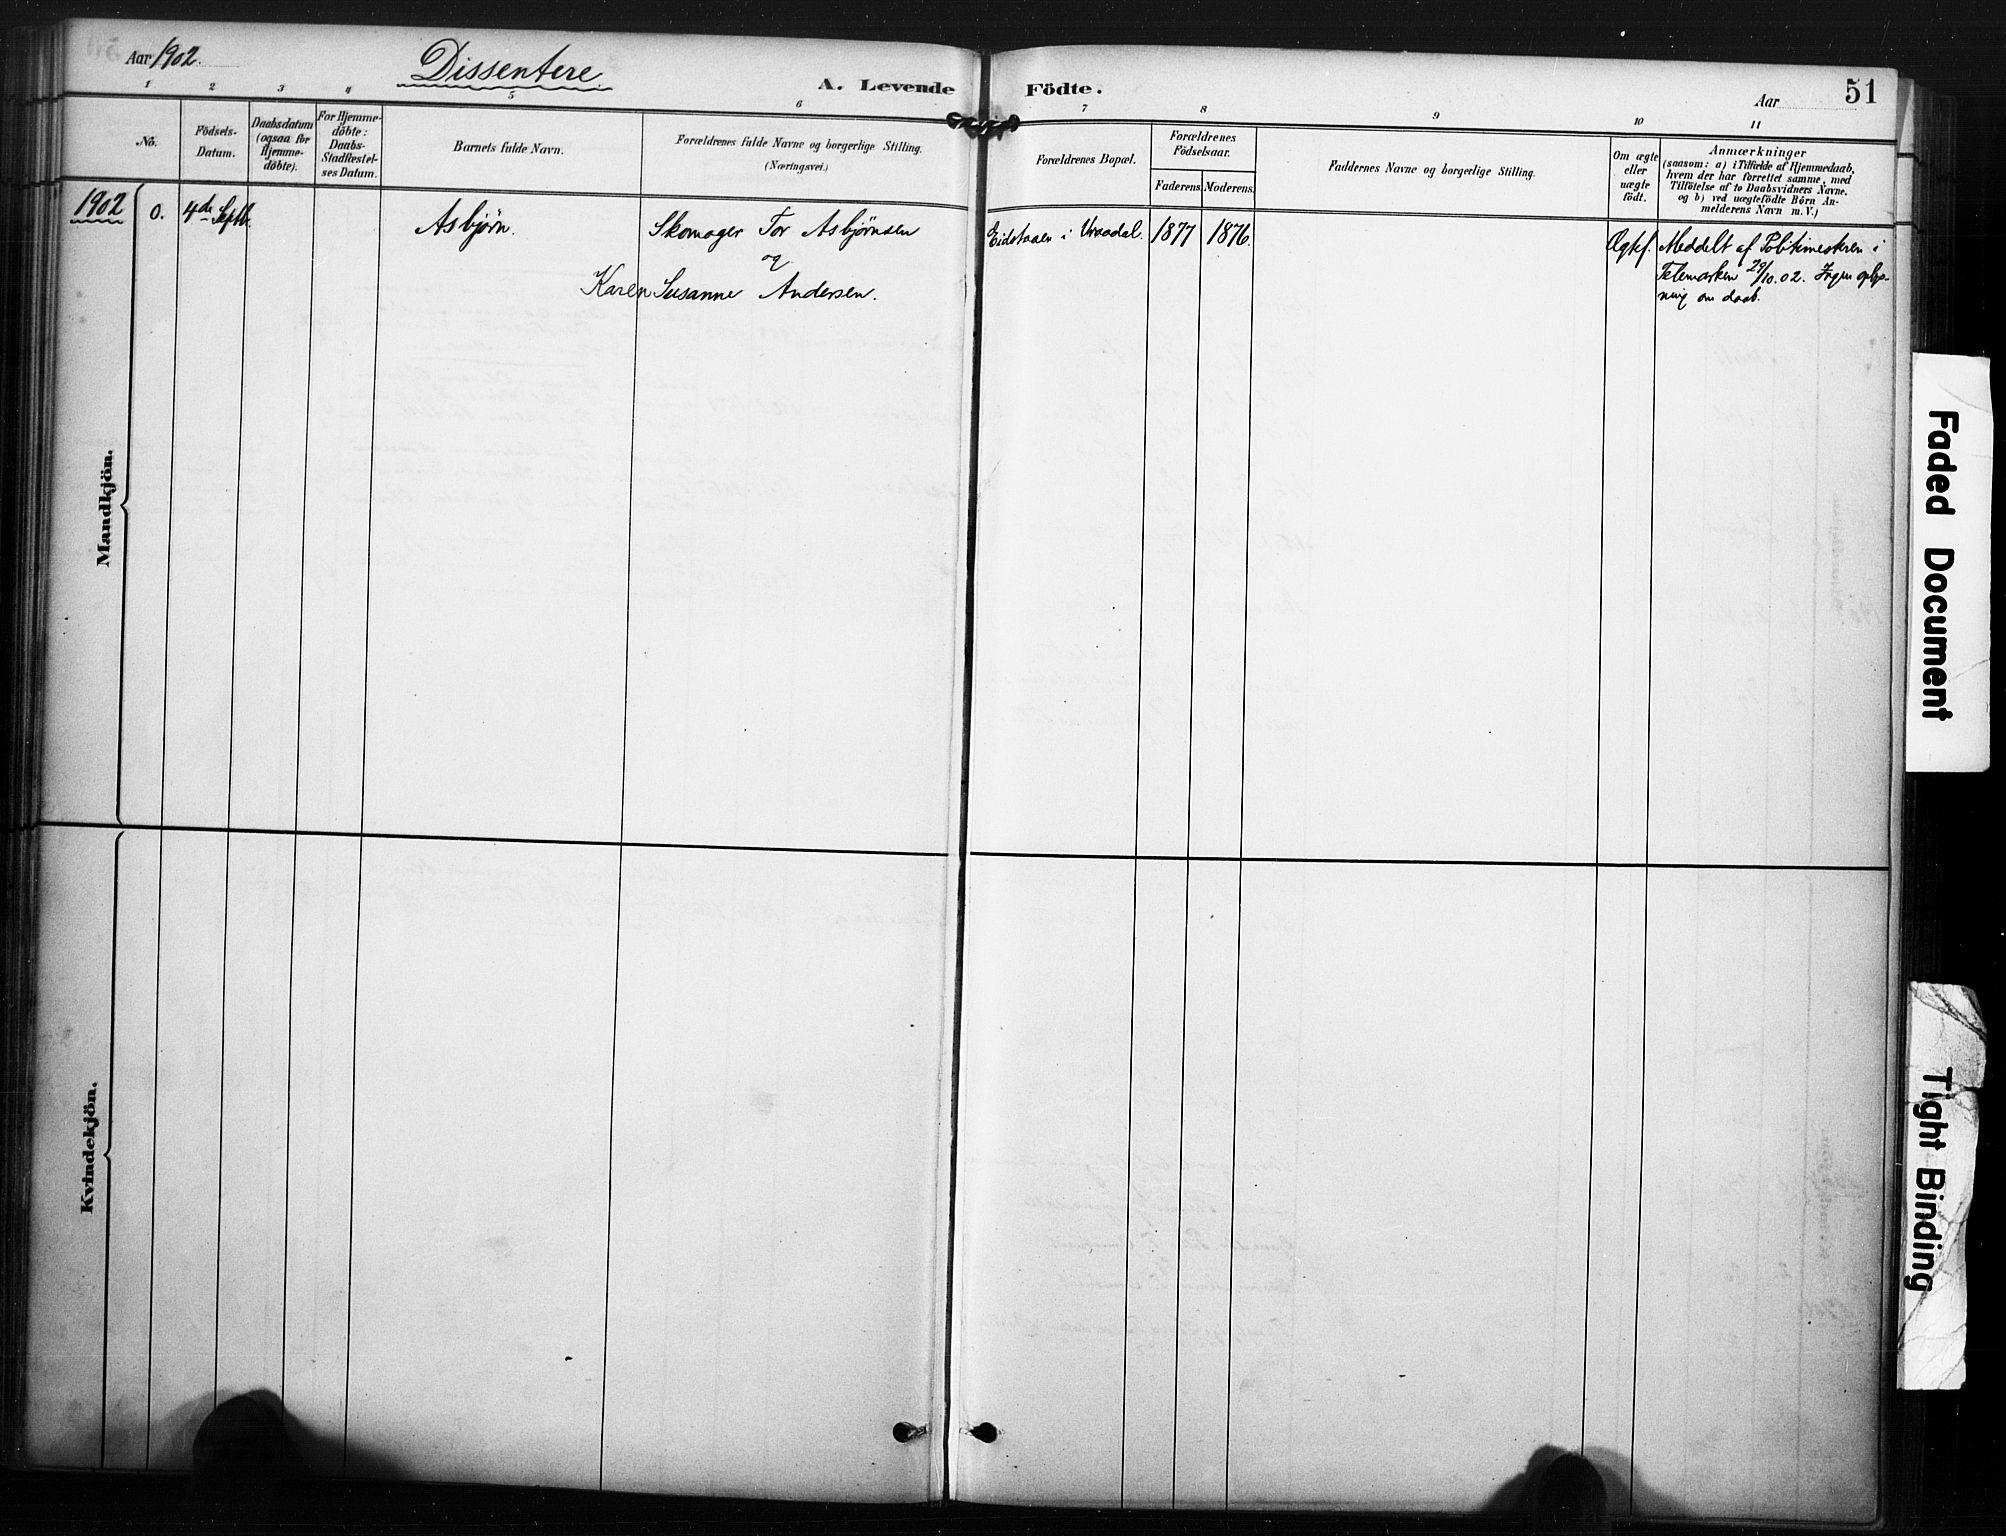 SAKO, Kviteseid kirkebøker, F/Fc/L0002: Ministerialbok nr. III 2, 1882-1908, s. 51